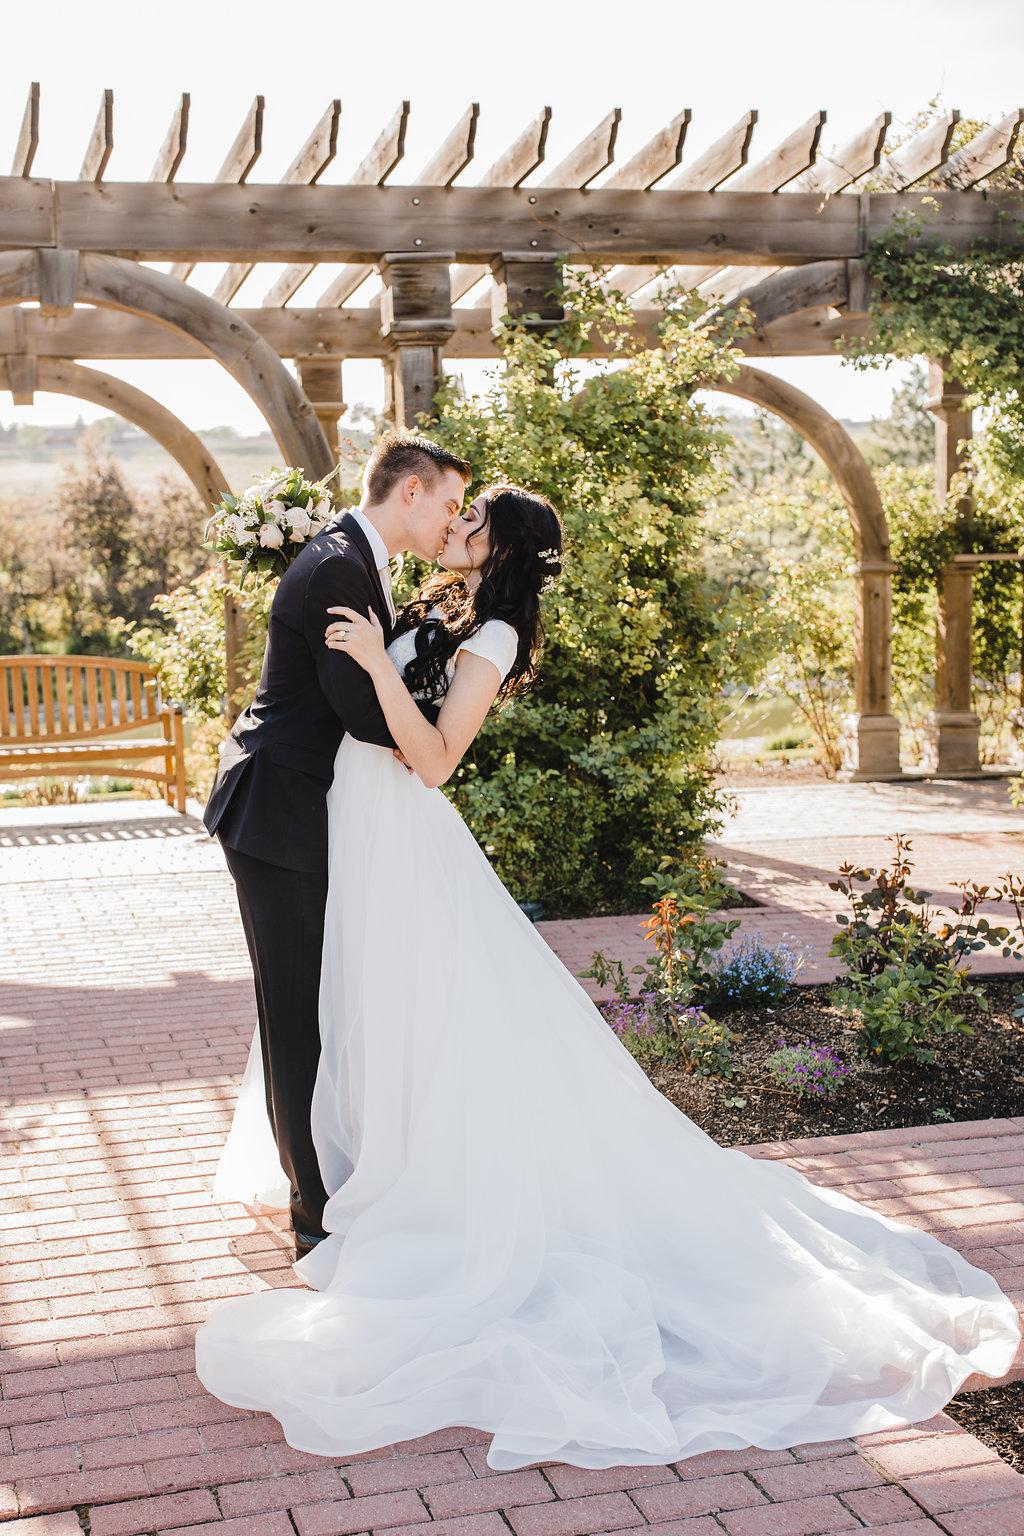 professional wedding photos garden formal photographer in salt lake city utah calli richards